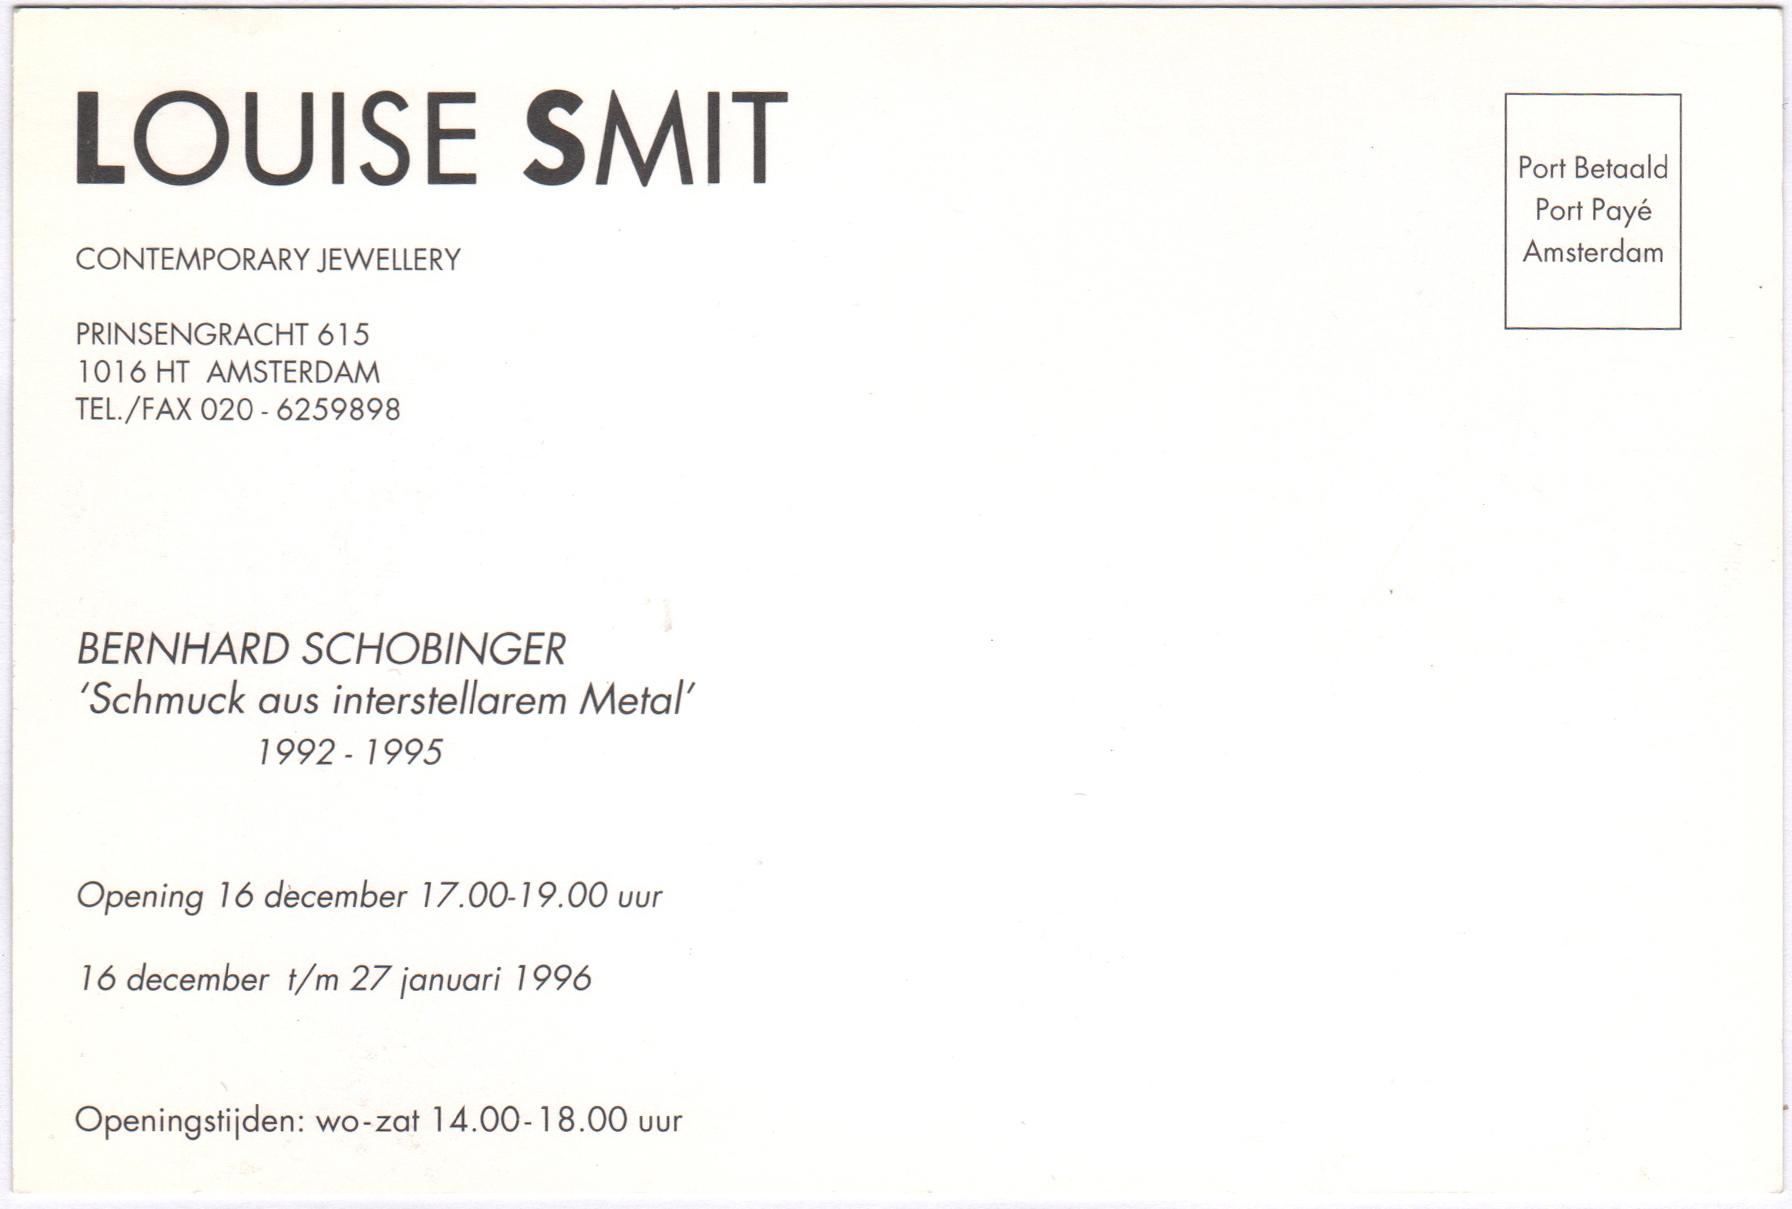 Uitnodiging opening Bernhard Schobinger, 16 december 1996